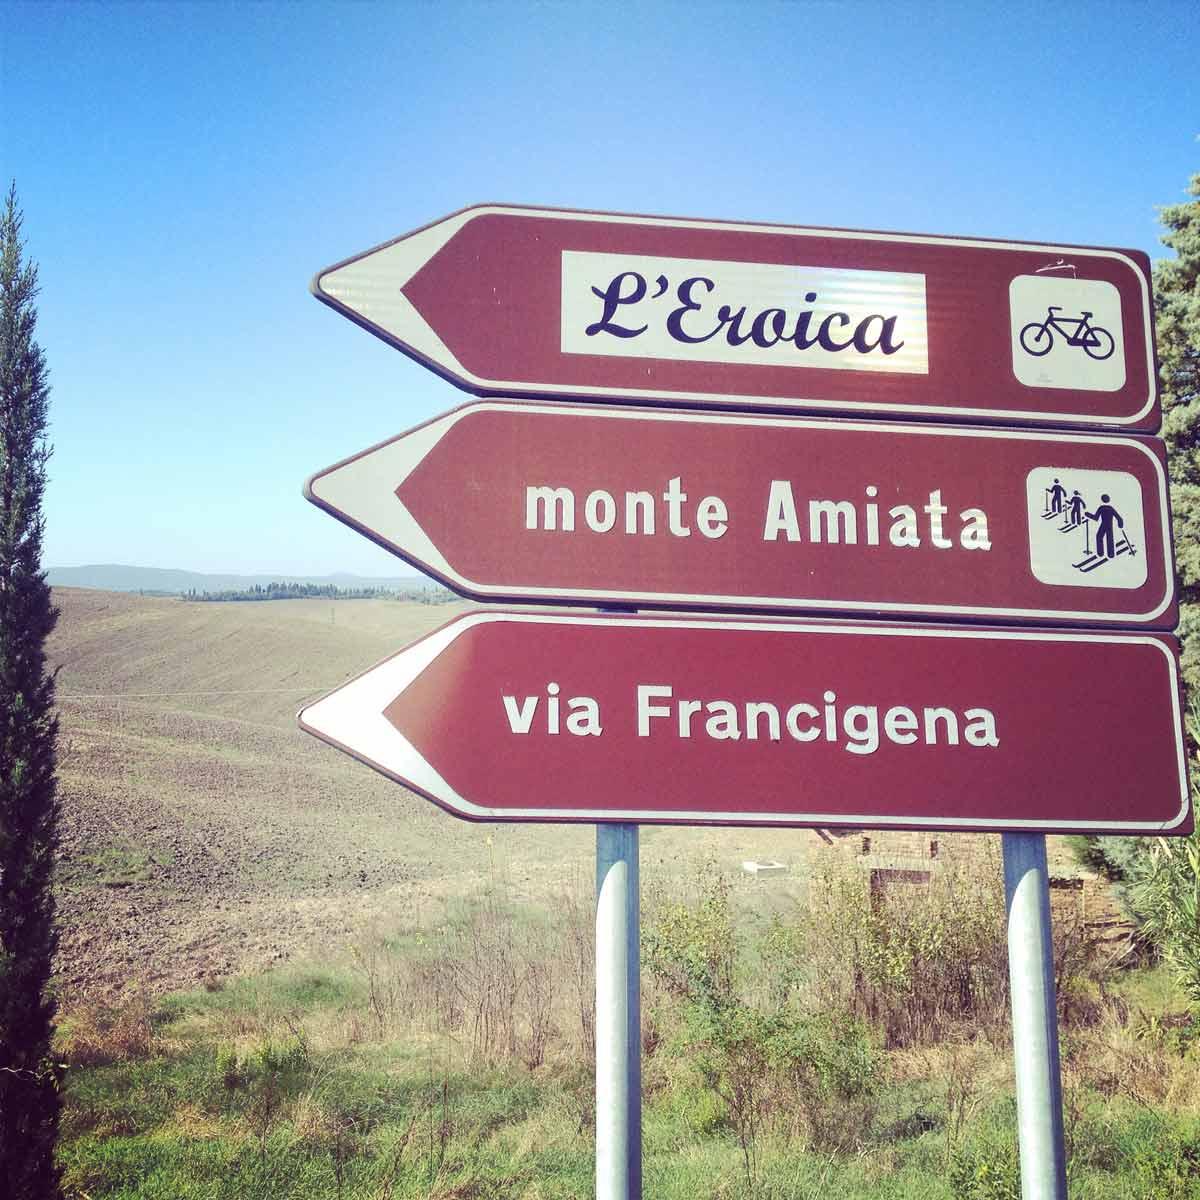 Francigena Press Tour // Via Francigena, L'Eroica, Monte Amiata: tre percorsi che s'incrociano